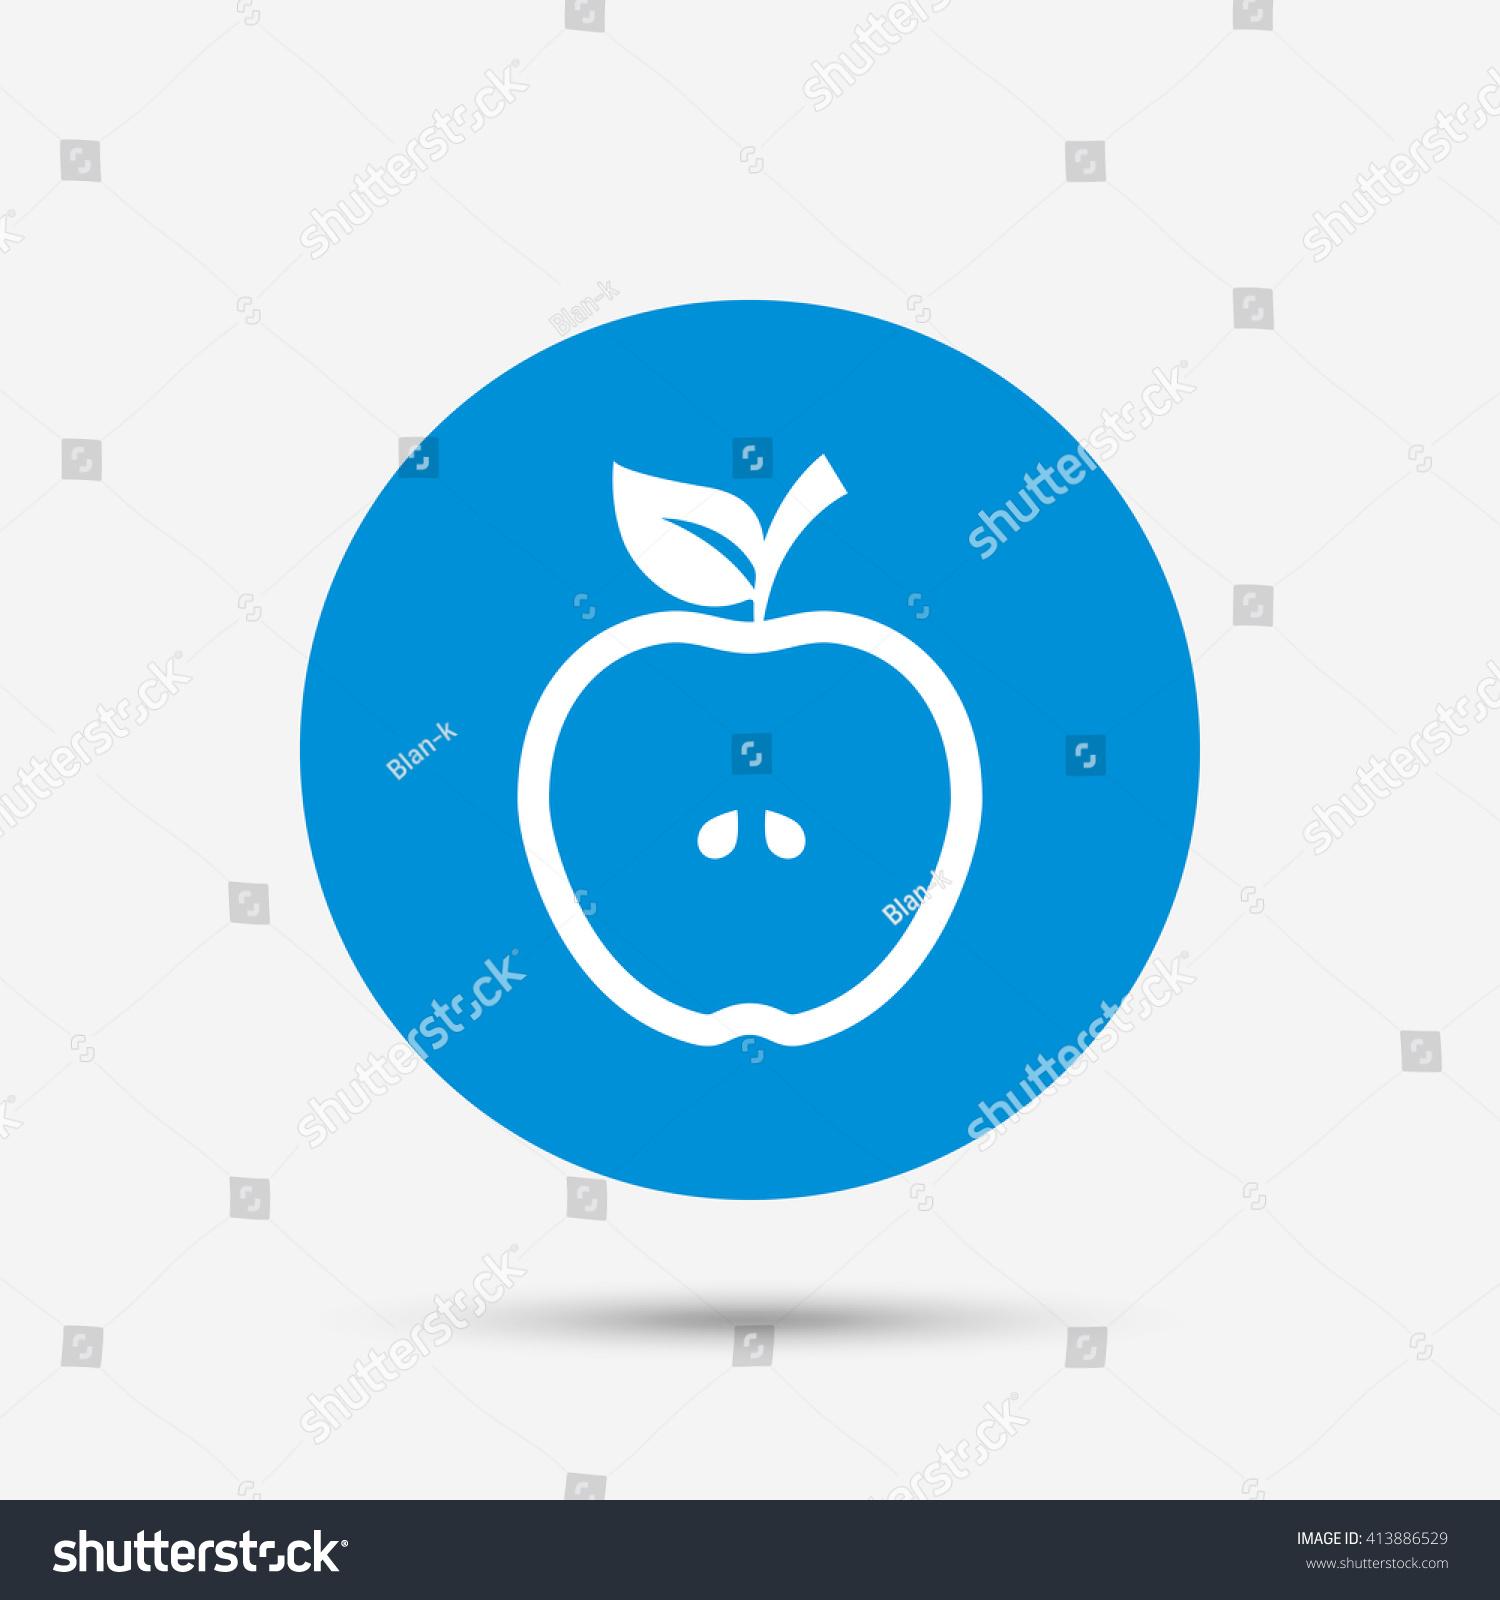 apple sign icon fruit leaf symbol stock vector 413886529 - shutterstock